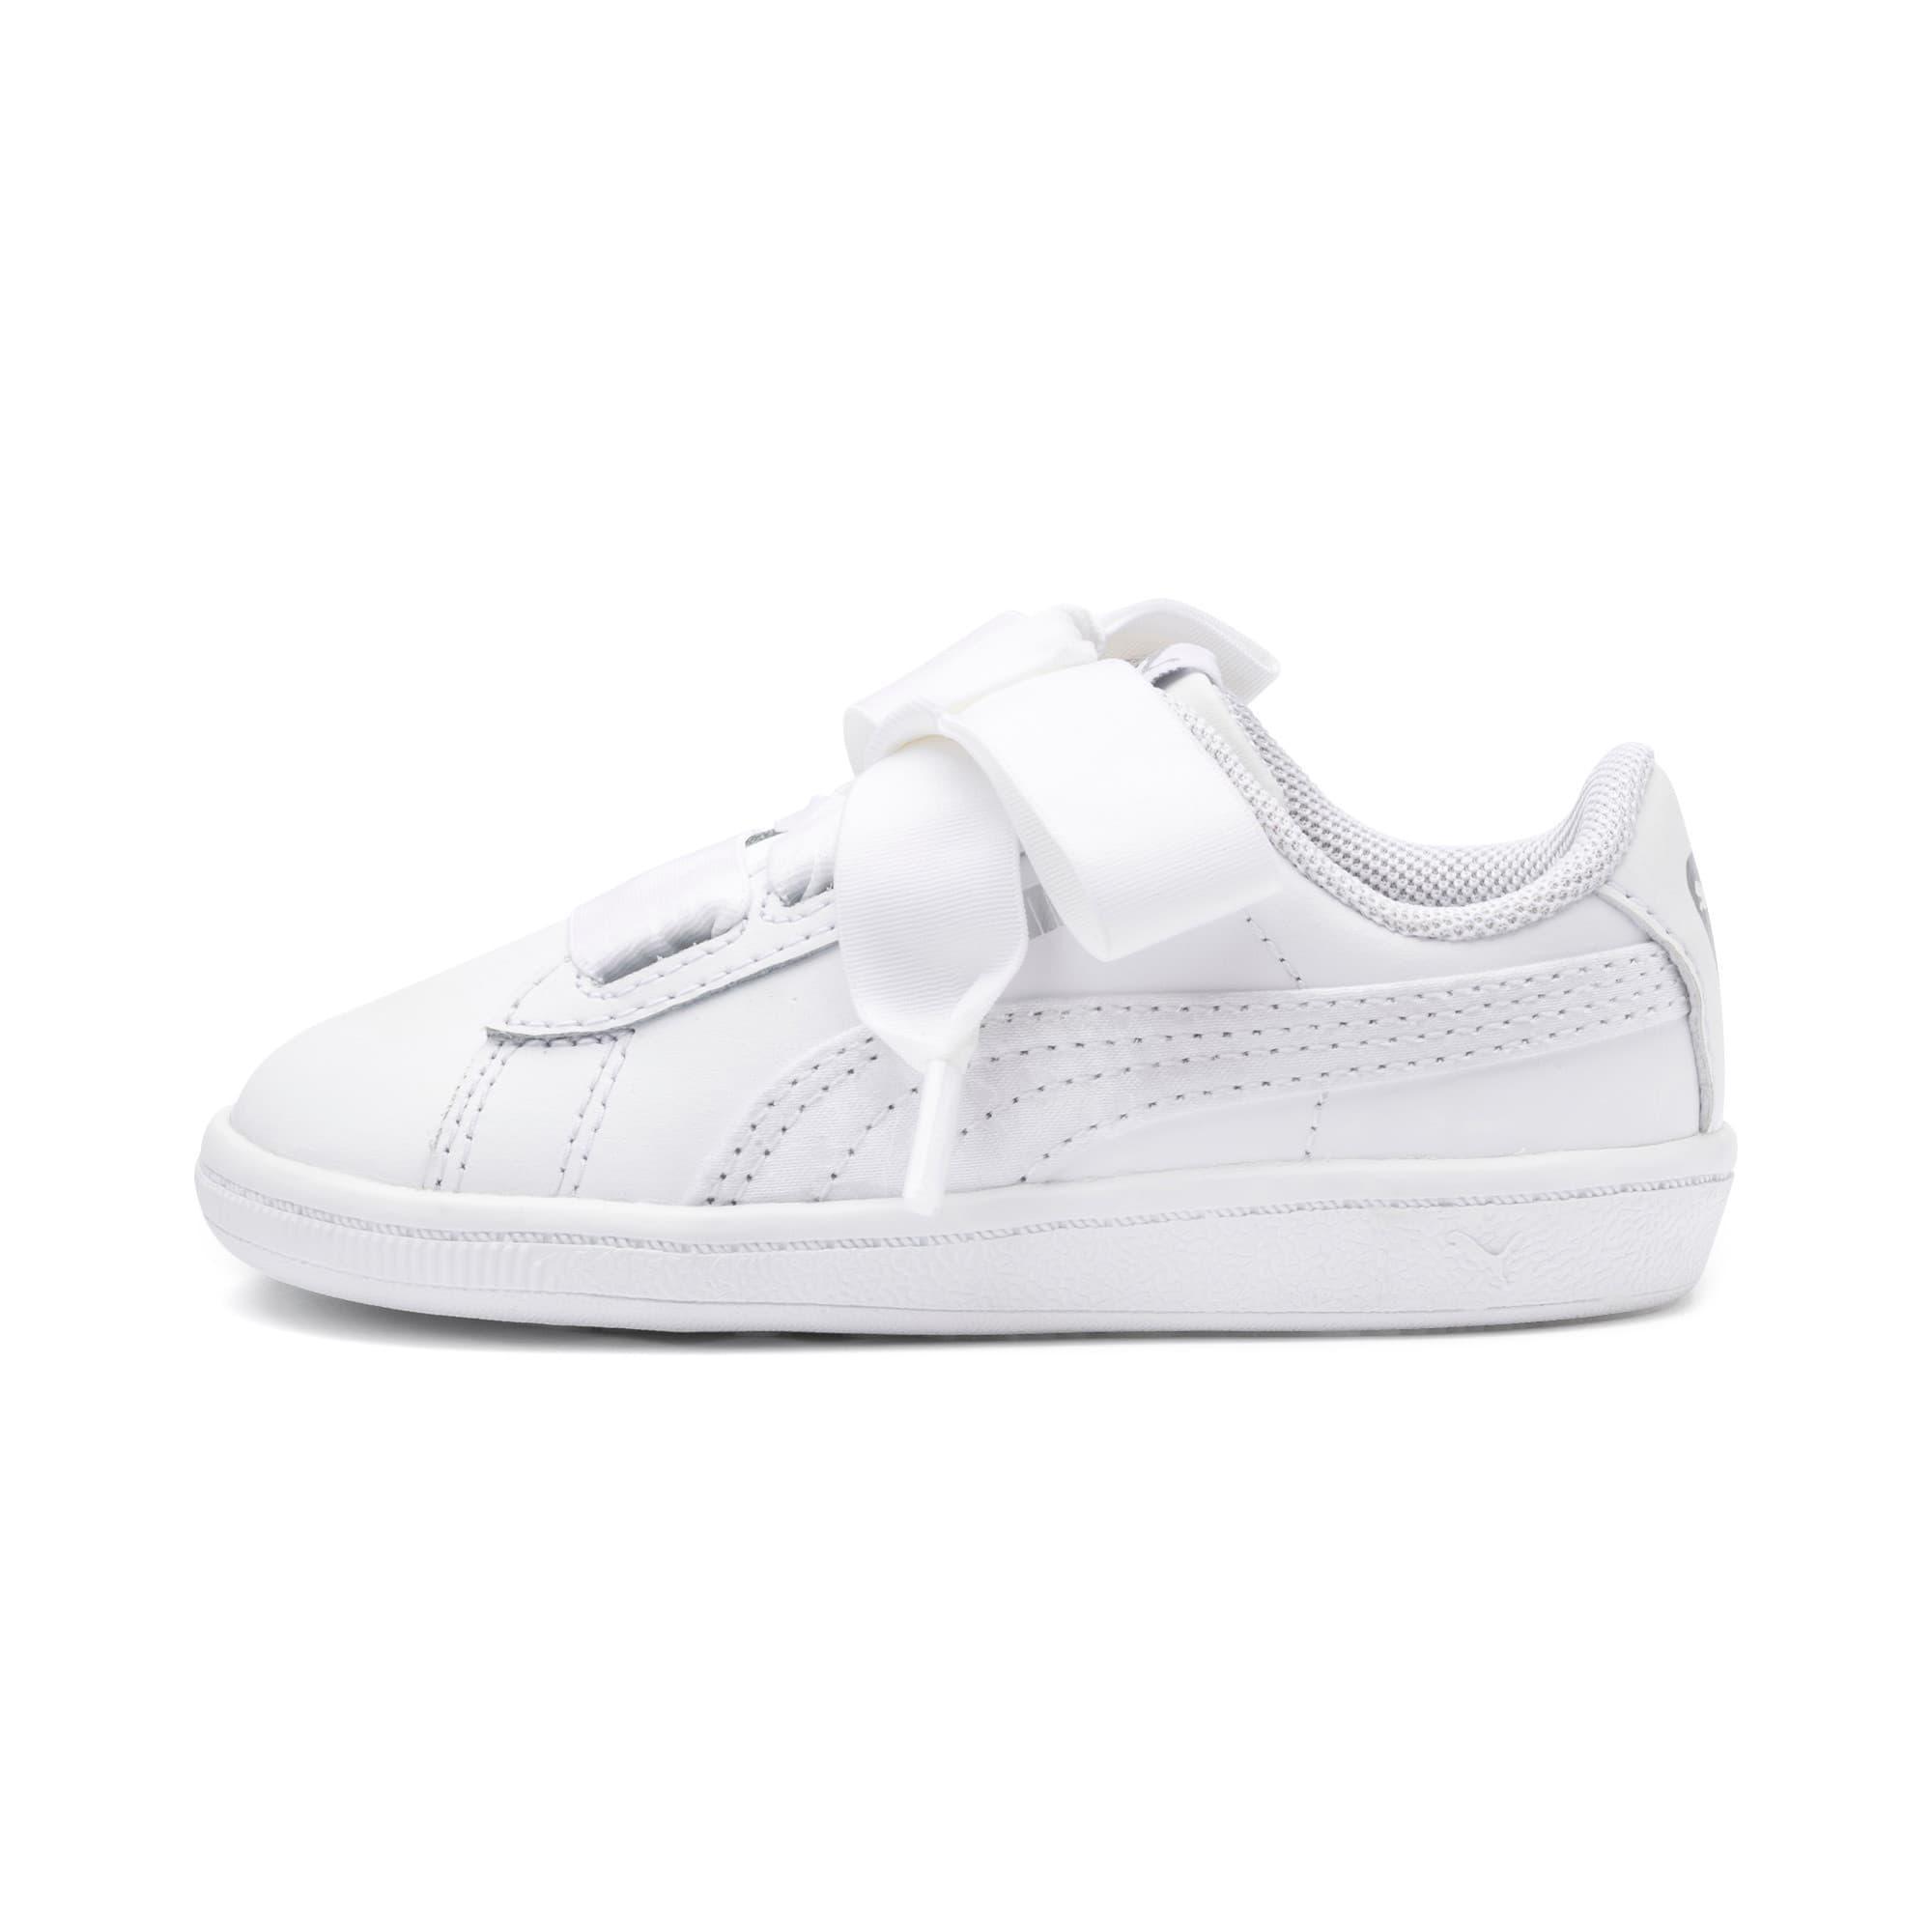 Miniatura 1 de ZapatosPUMA Vikky Ribbon Satin AC para bebés, Puma White-Puma White, mediano